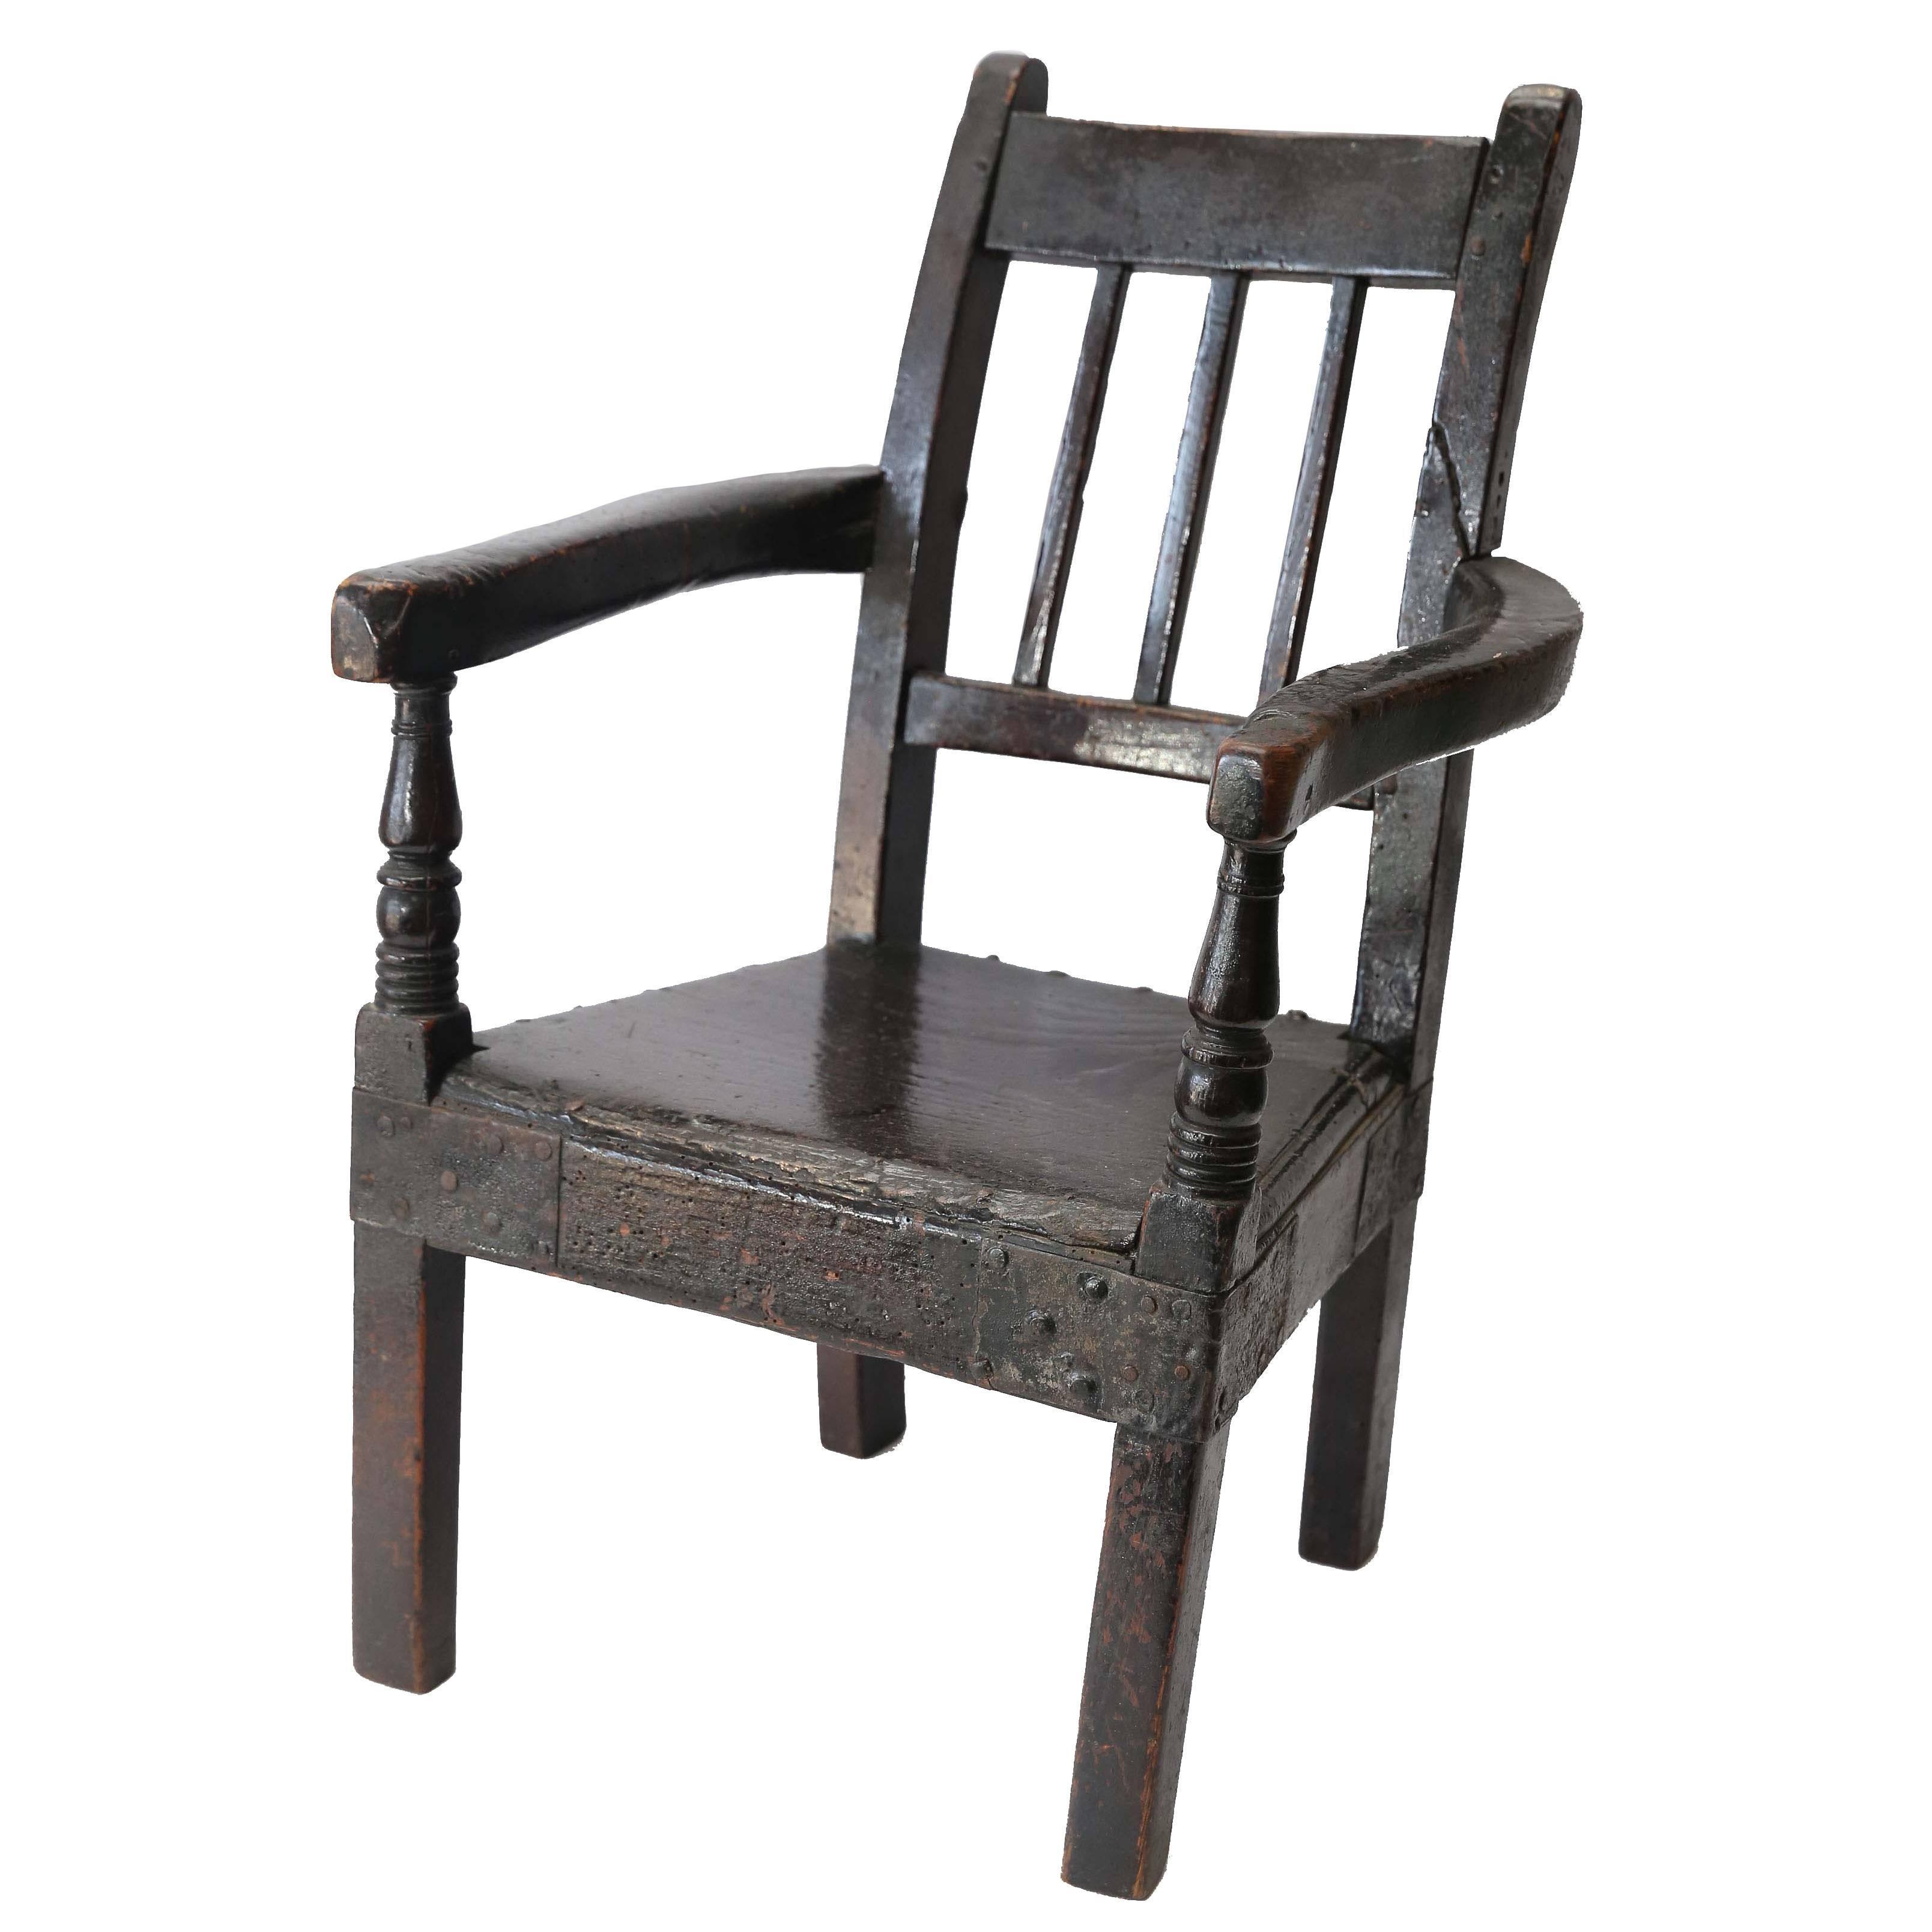 19th Century Child's Chair